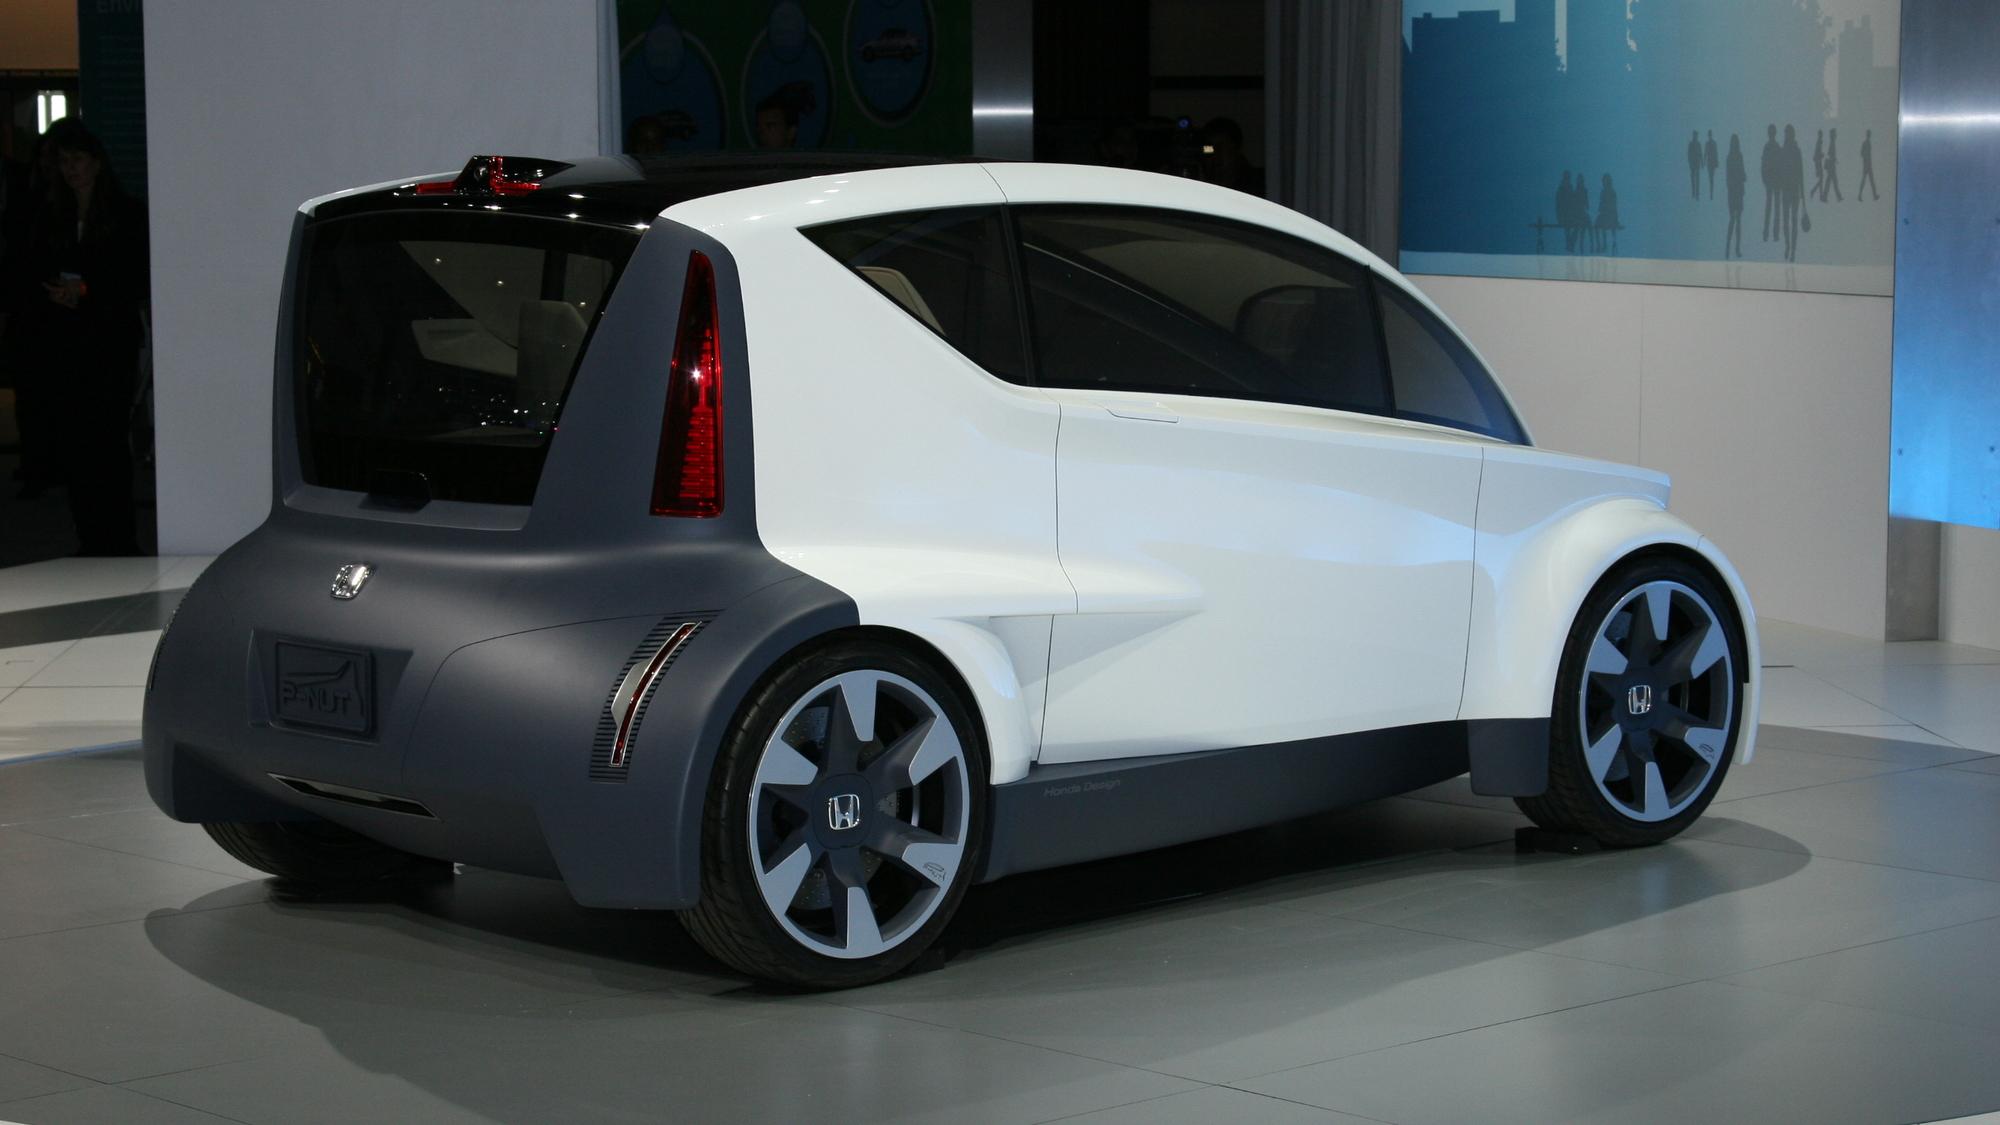 2009 Honda P-NUT Concept